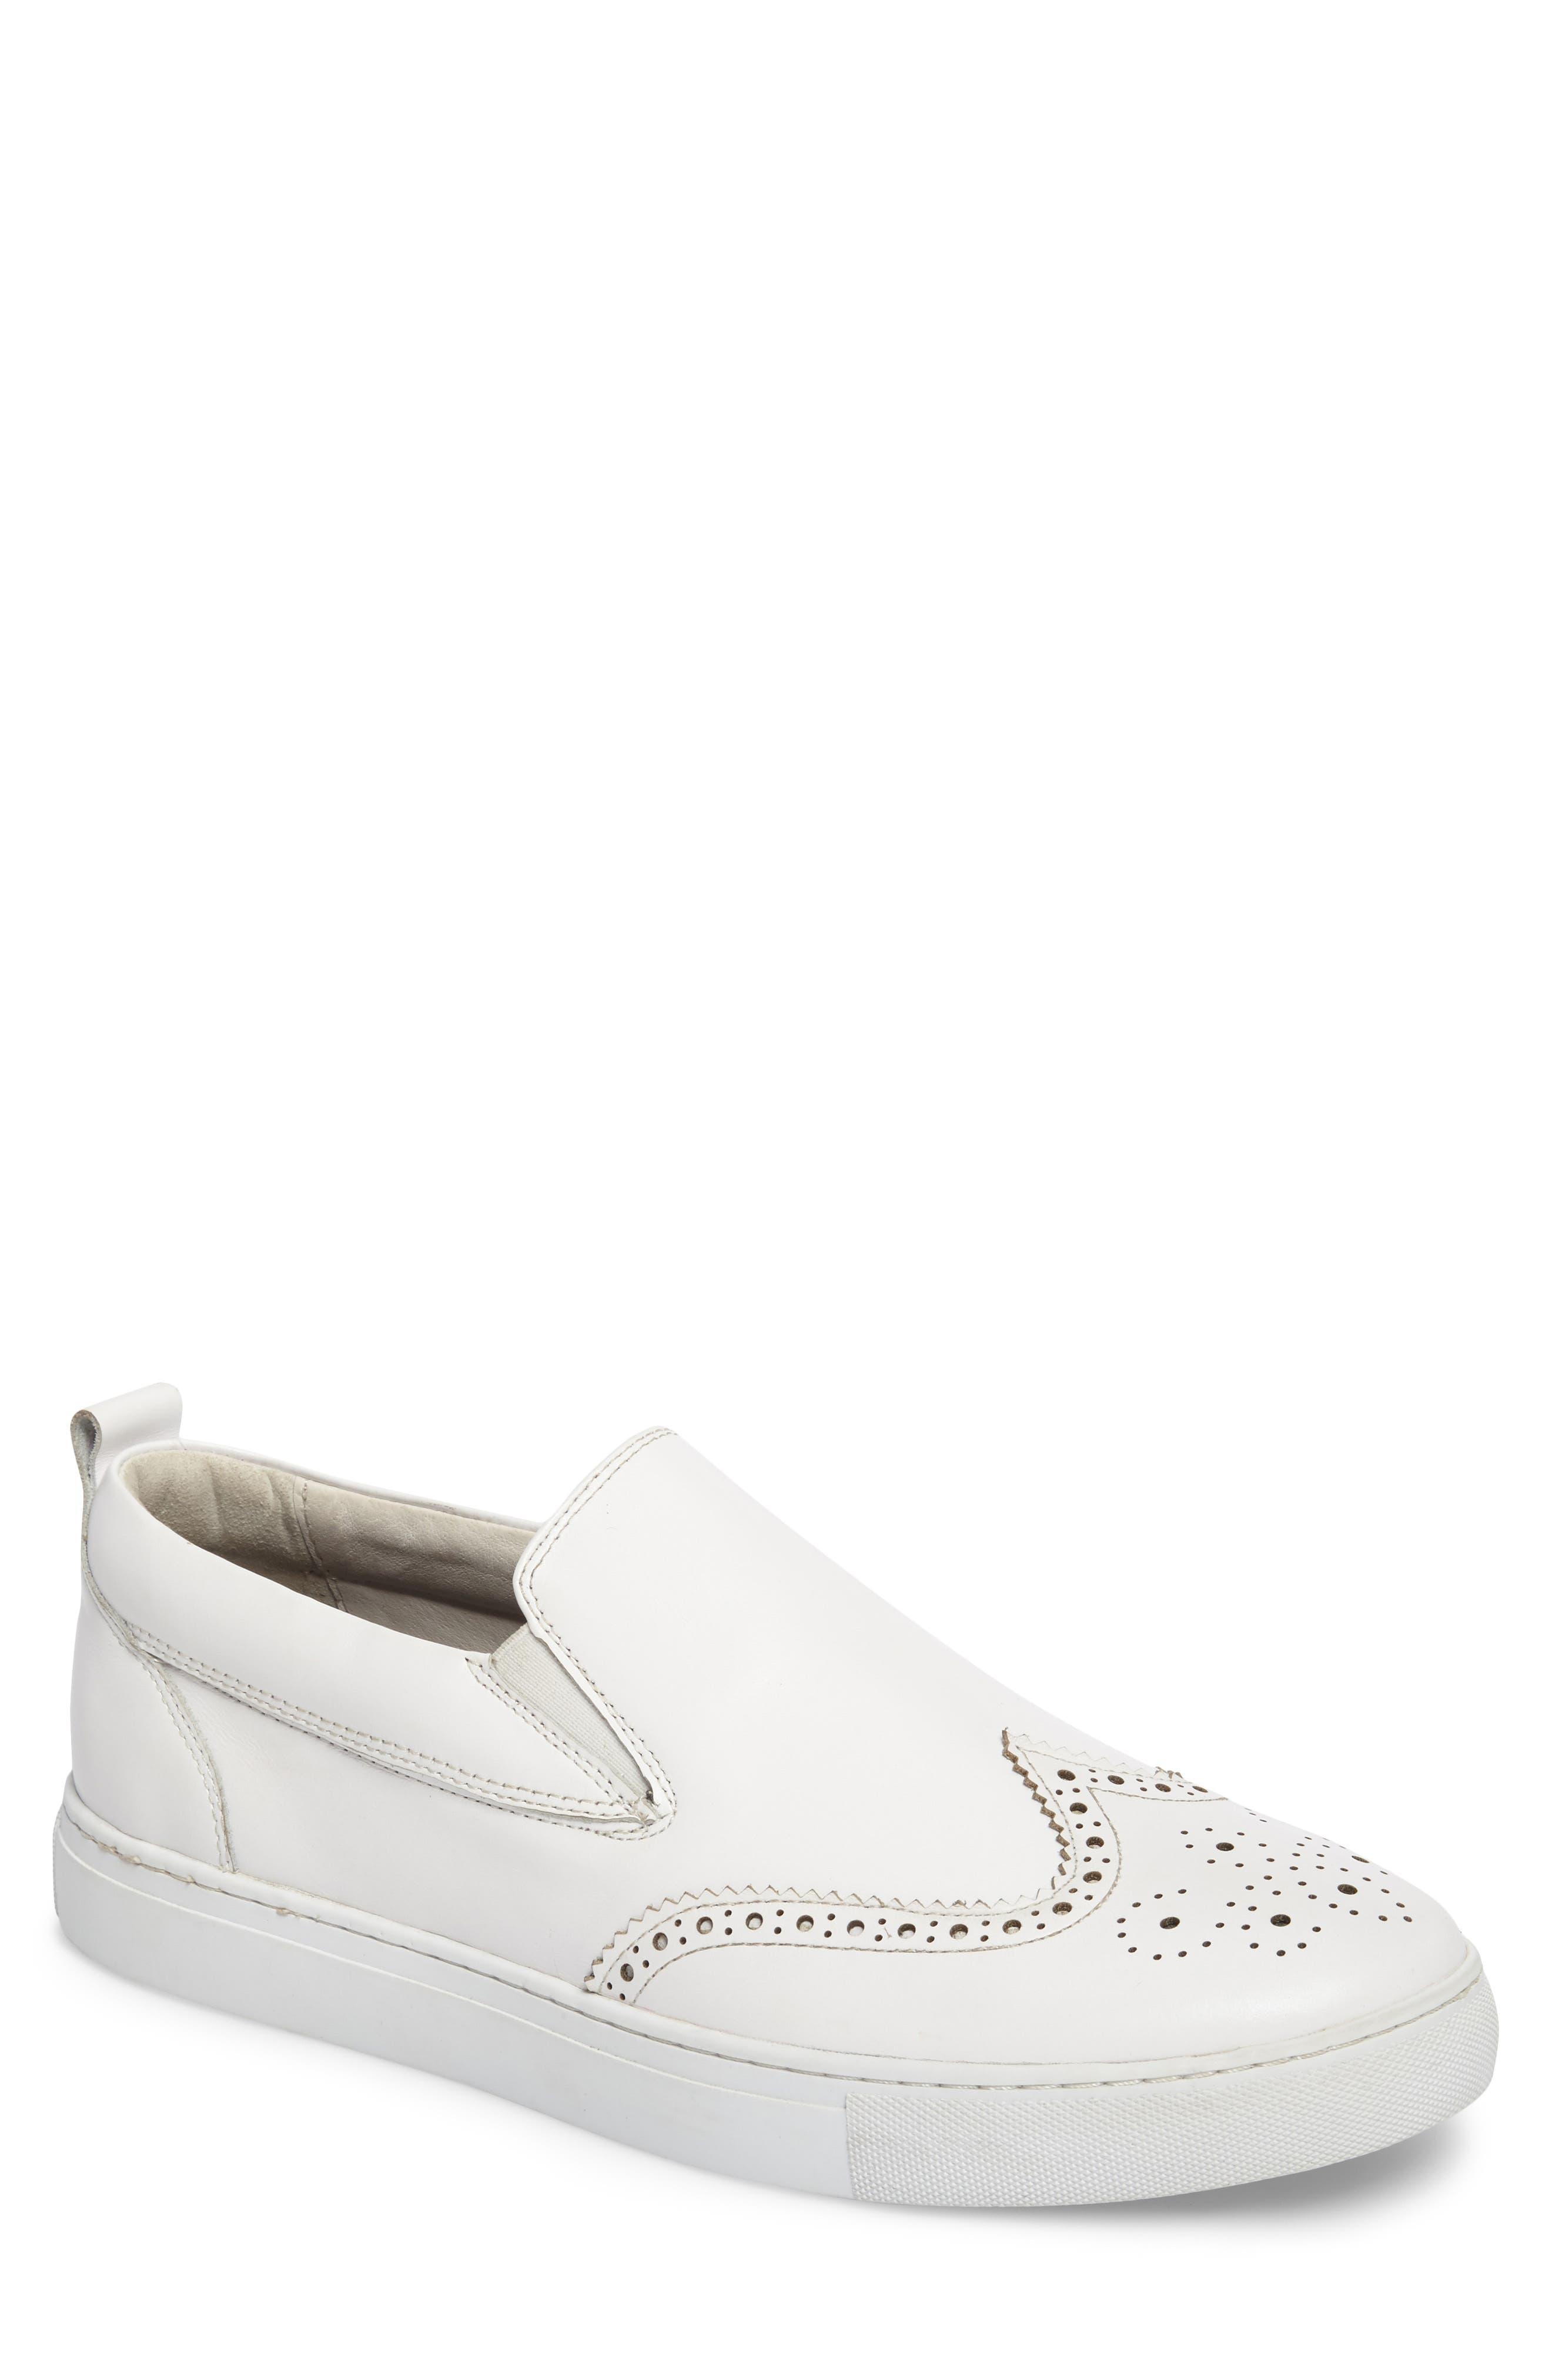 Main Image - Zanzara Ali Wingtip Slip-On Sneaker (Men)